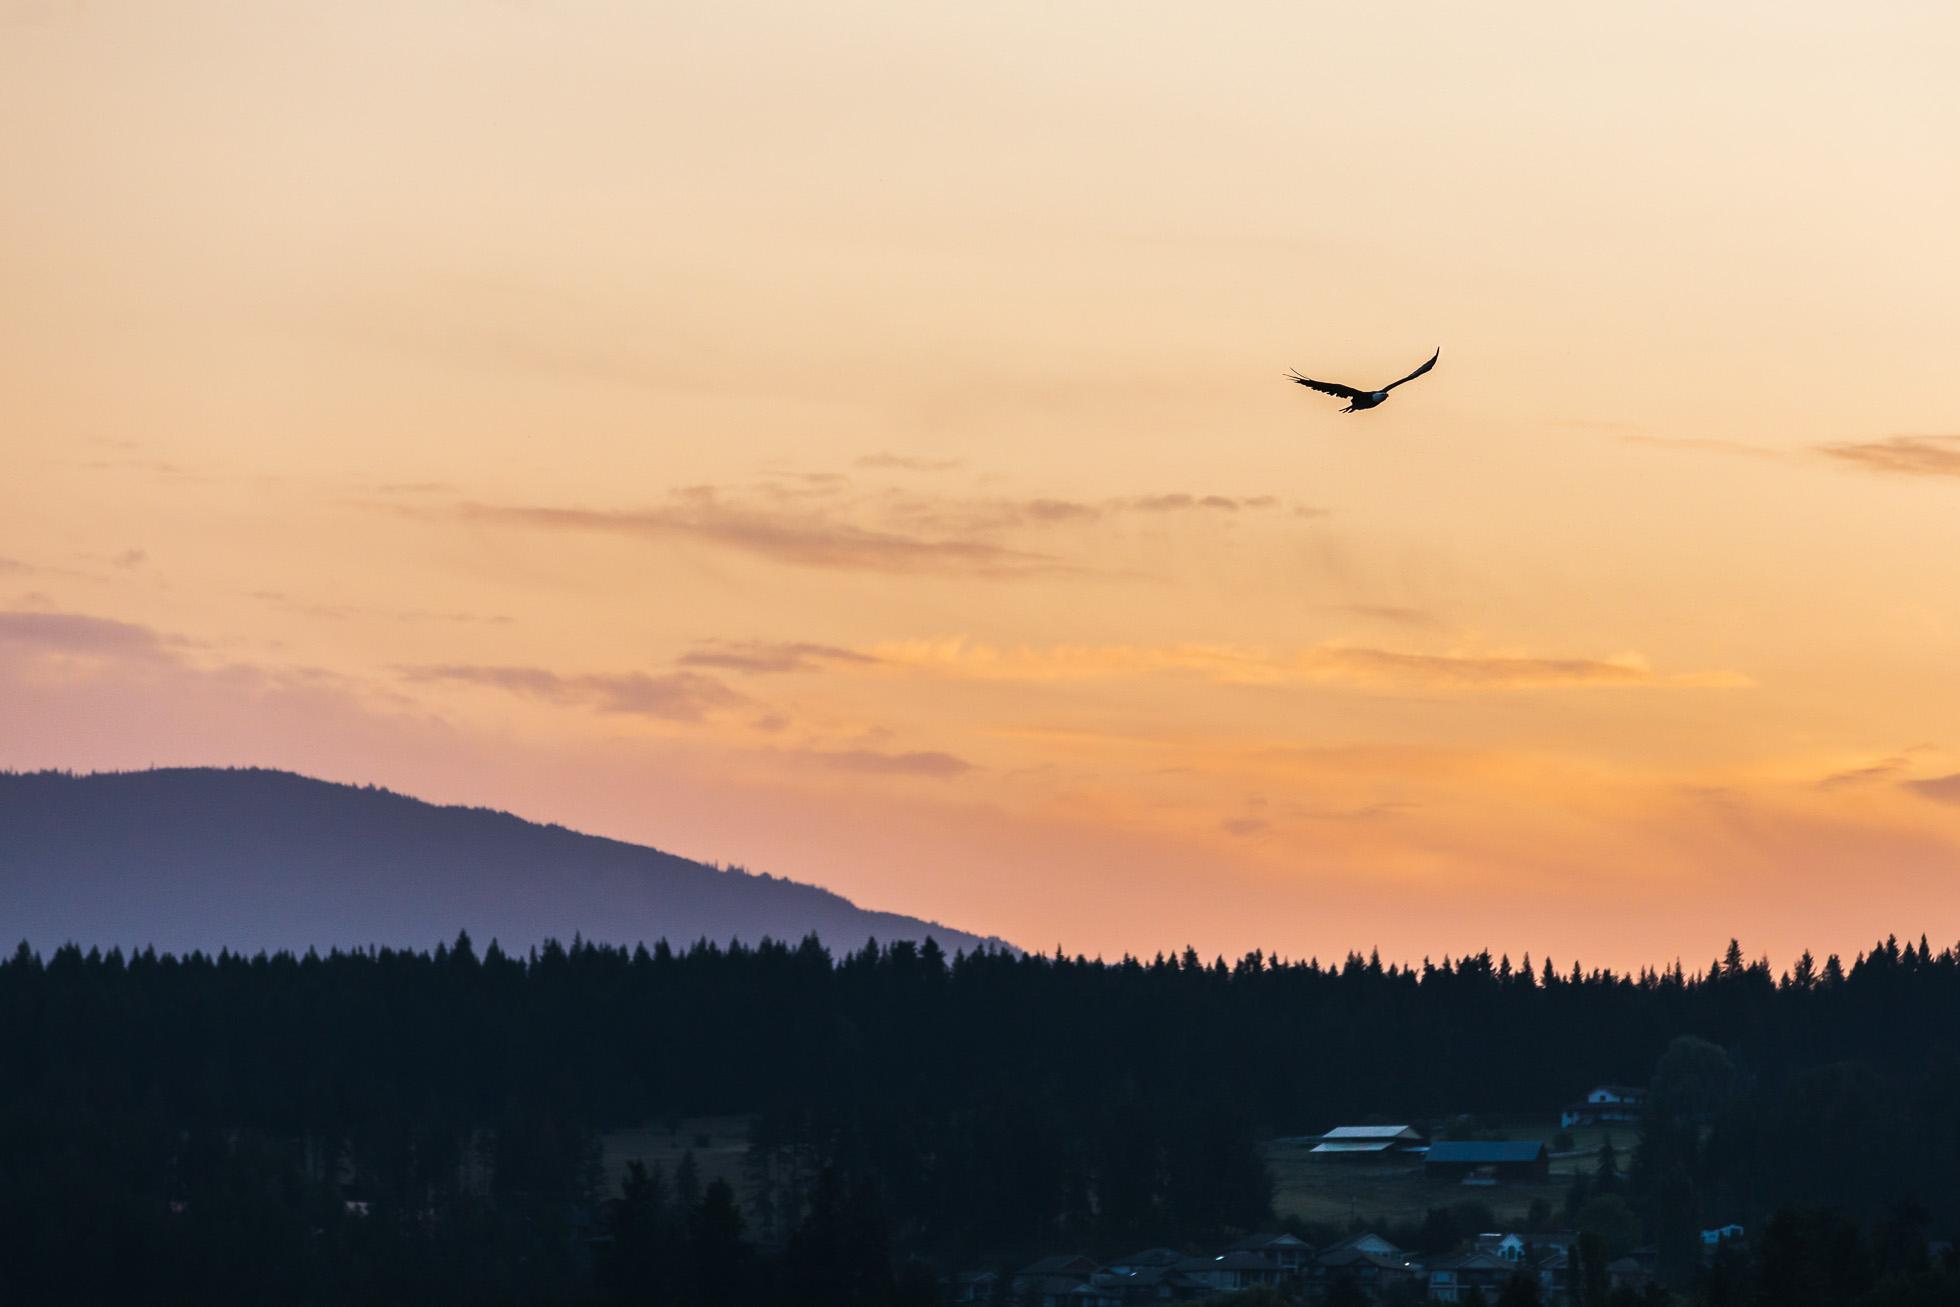 Bald Eagle in the pre-sunrise light.